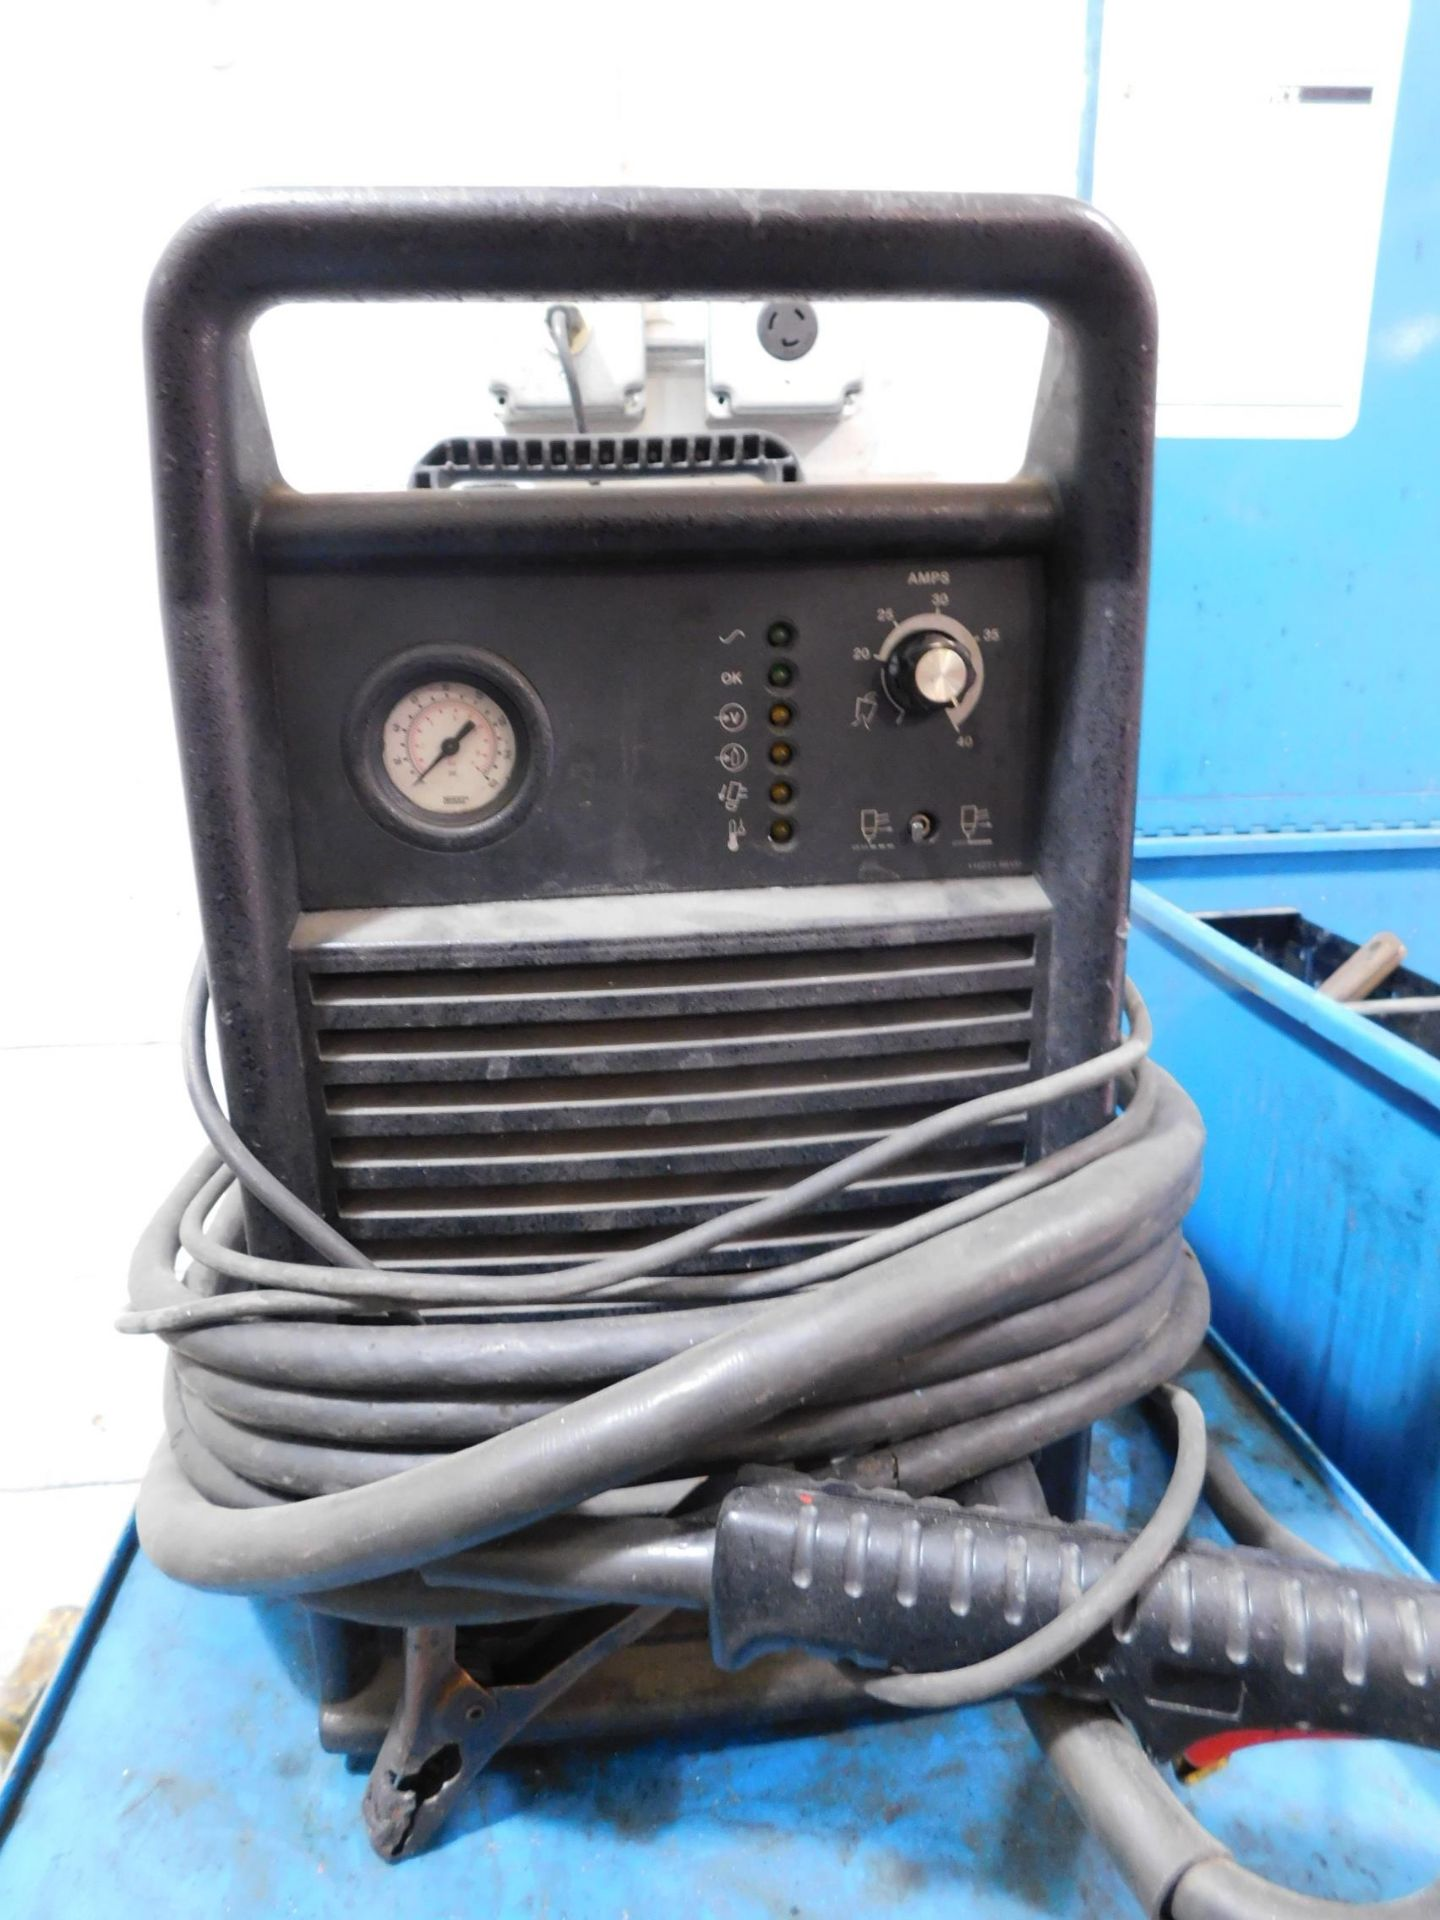 Hypertherm Model Powermax 600 Plasma Cutter, SN PMX600-037767, 230V, 1 phs.